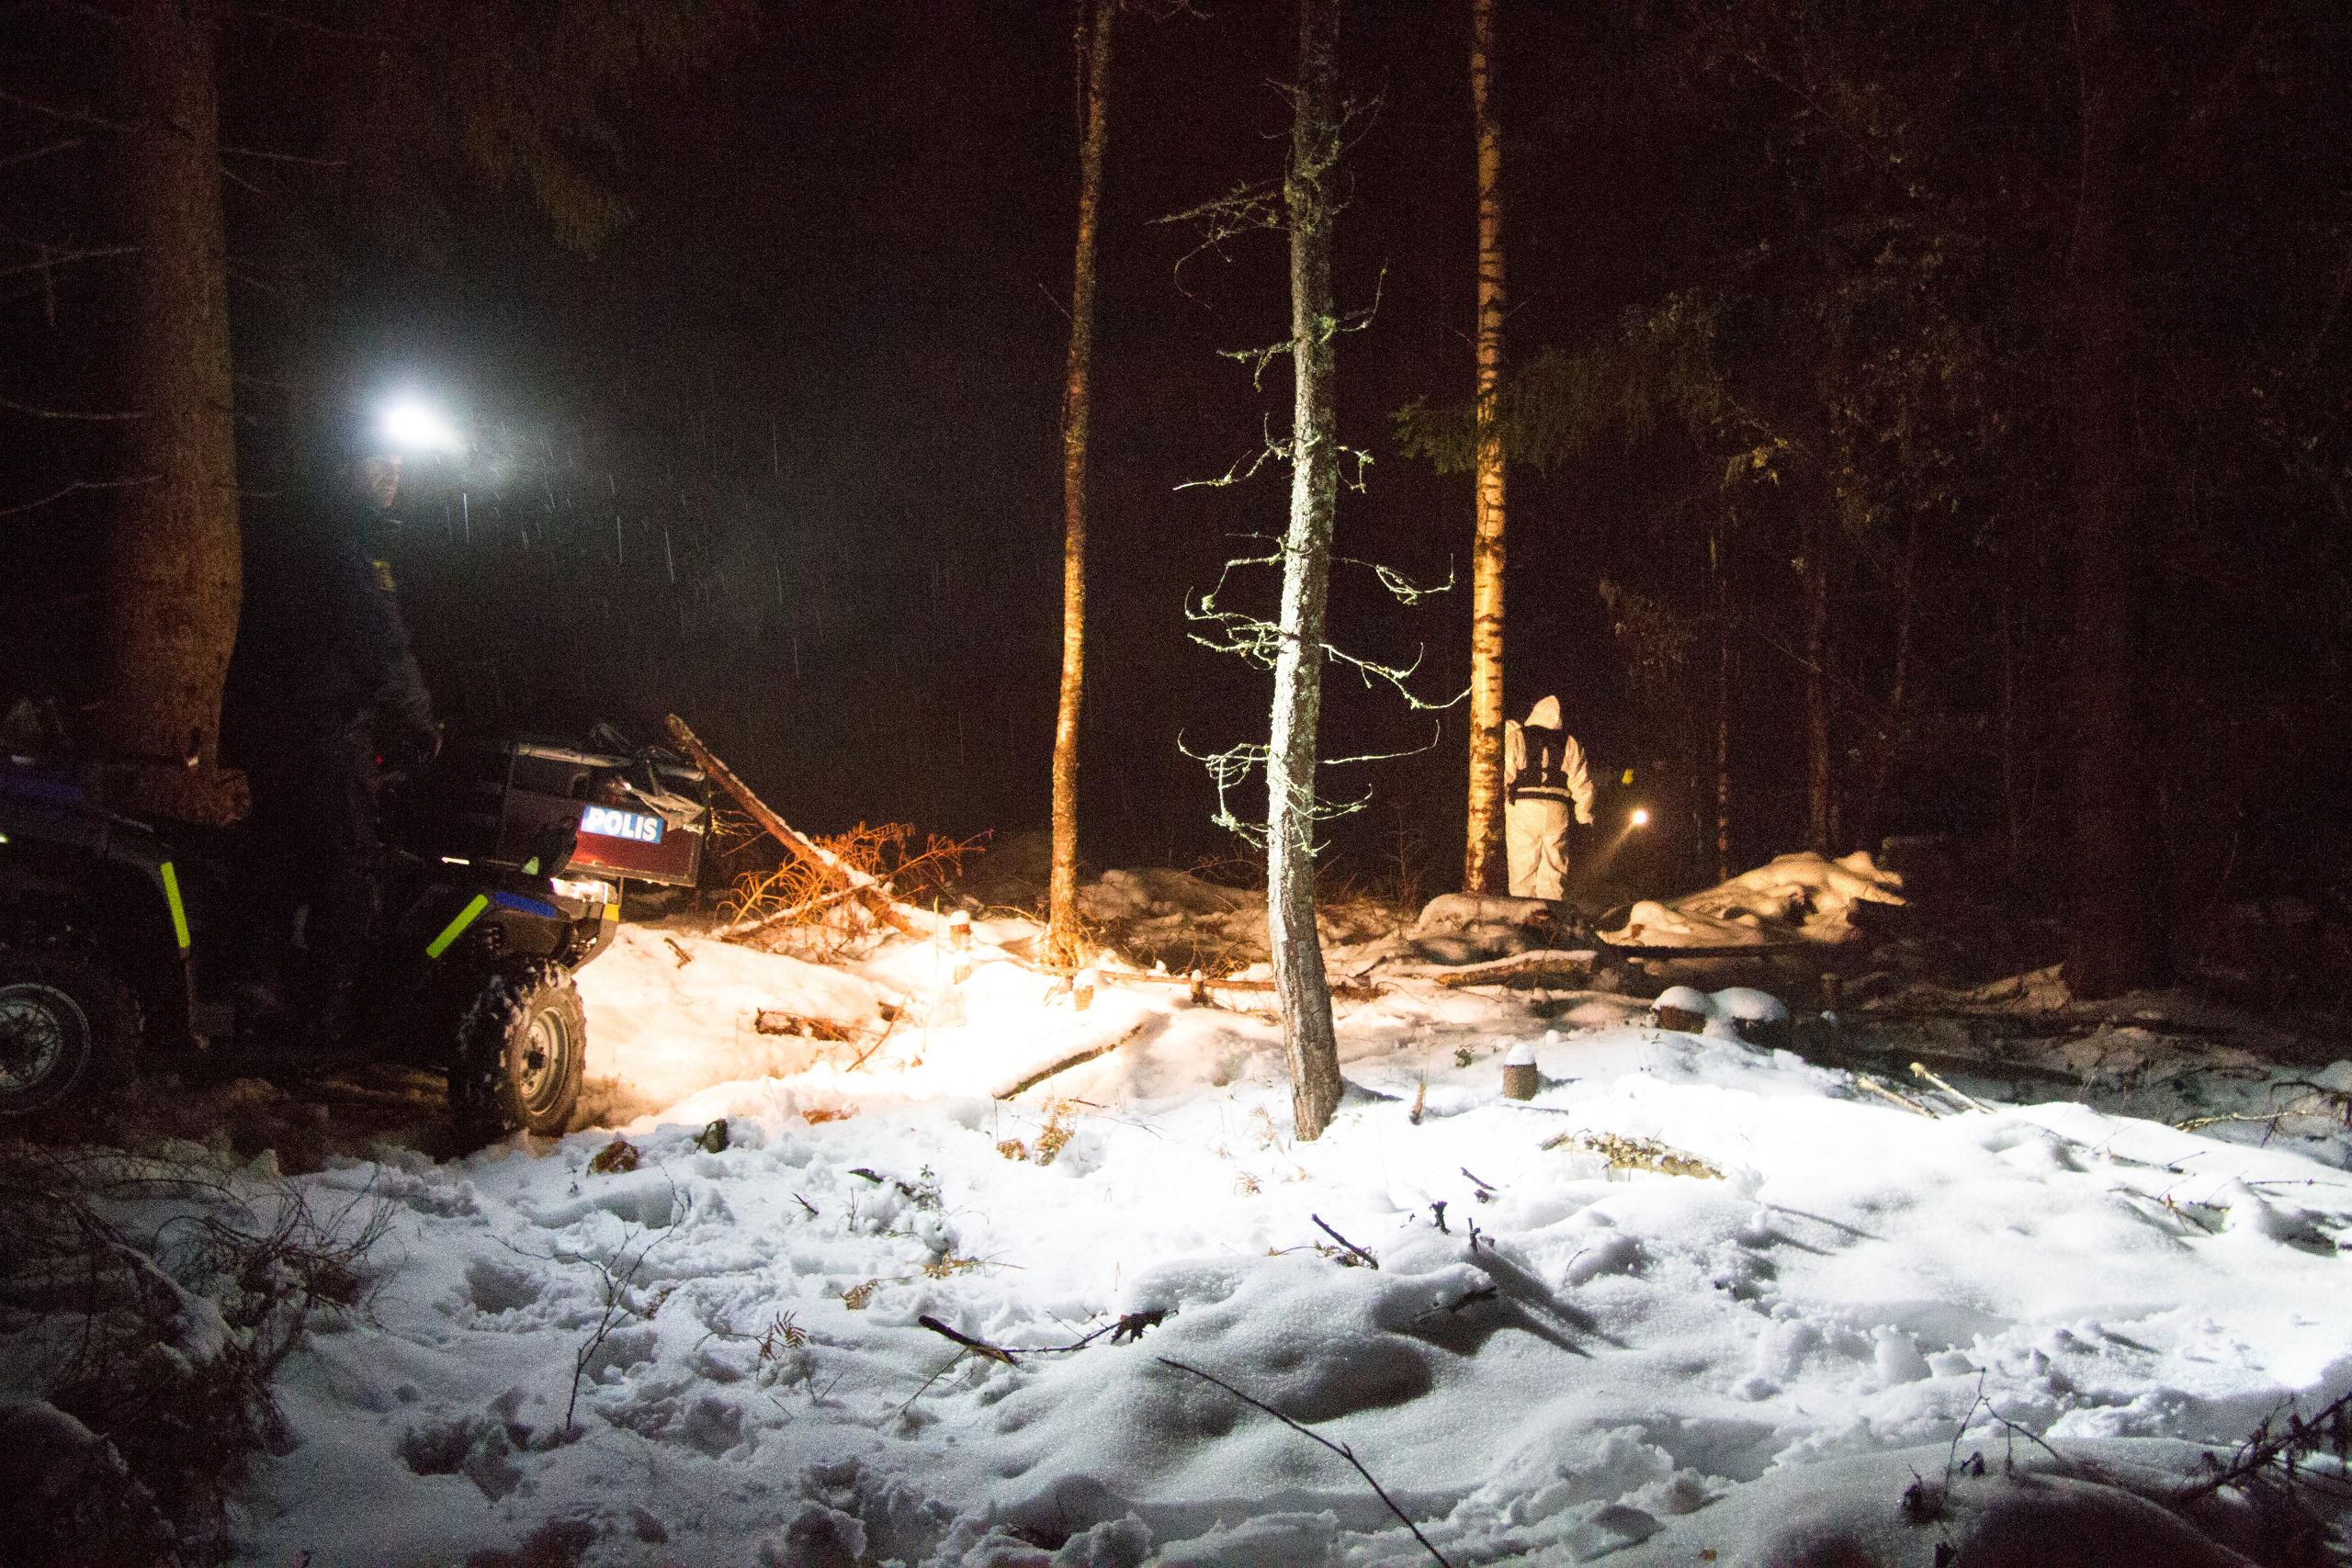 82 aring hittad efter dygn i skogen